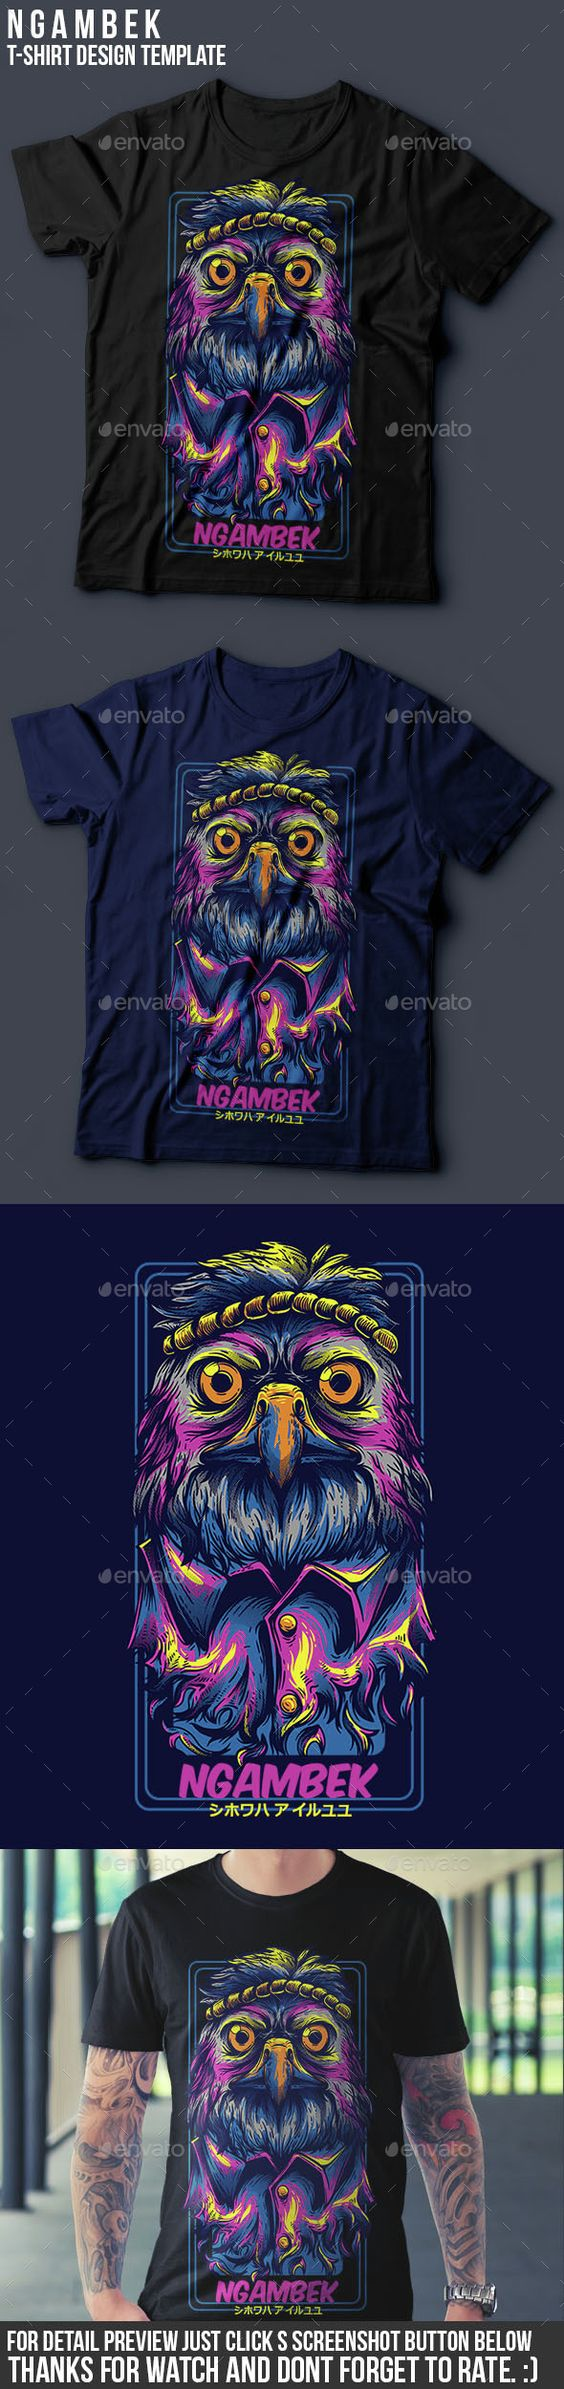 Shirt design resolution - Ngambek T Shirt Design Funny Designs